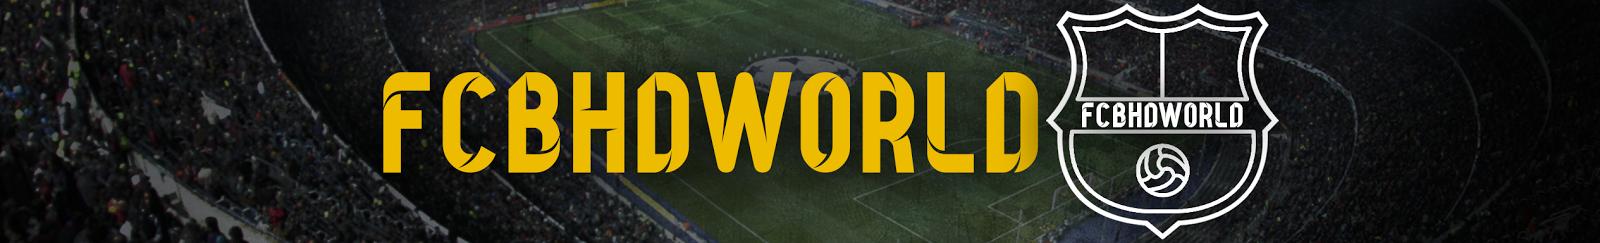 FCBHDWorld